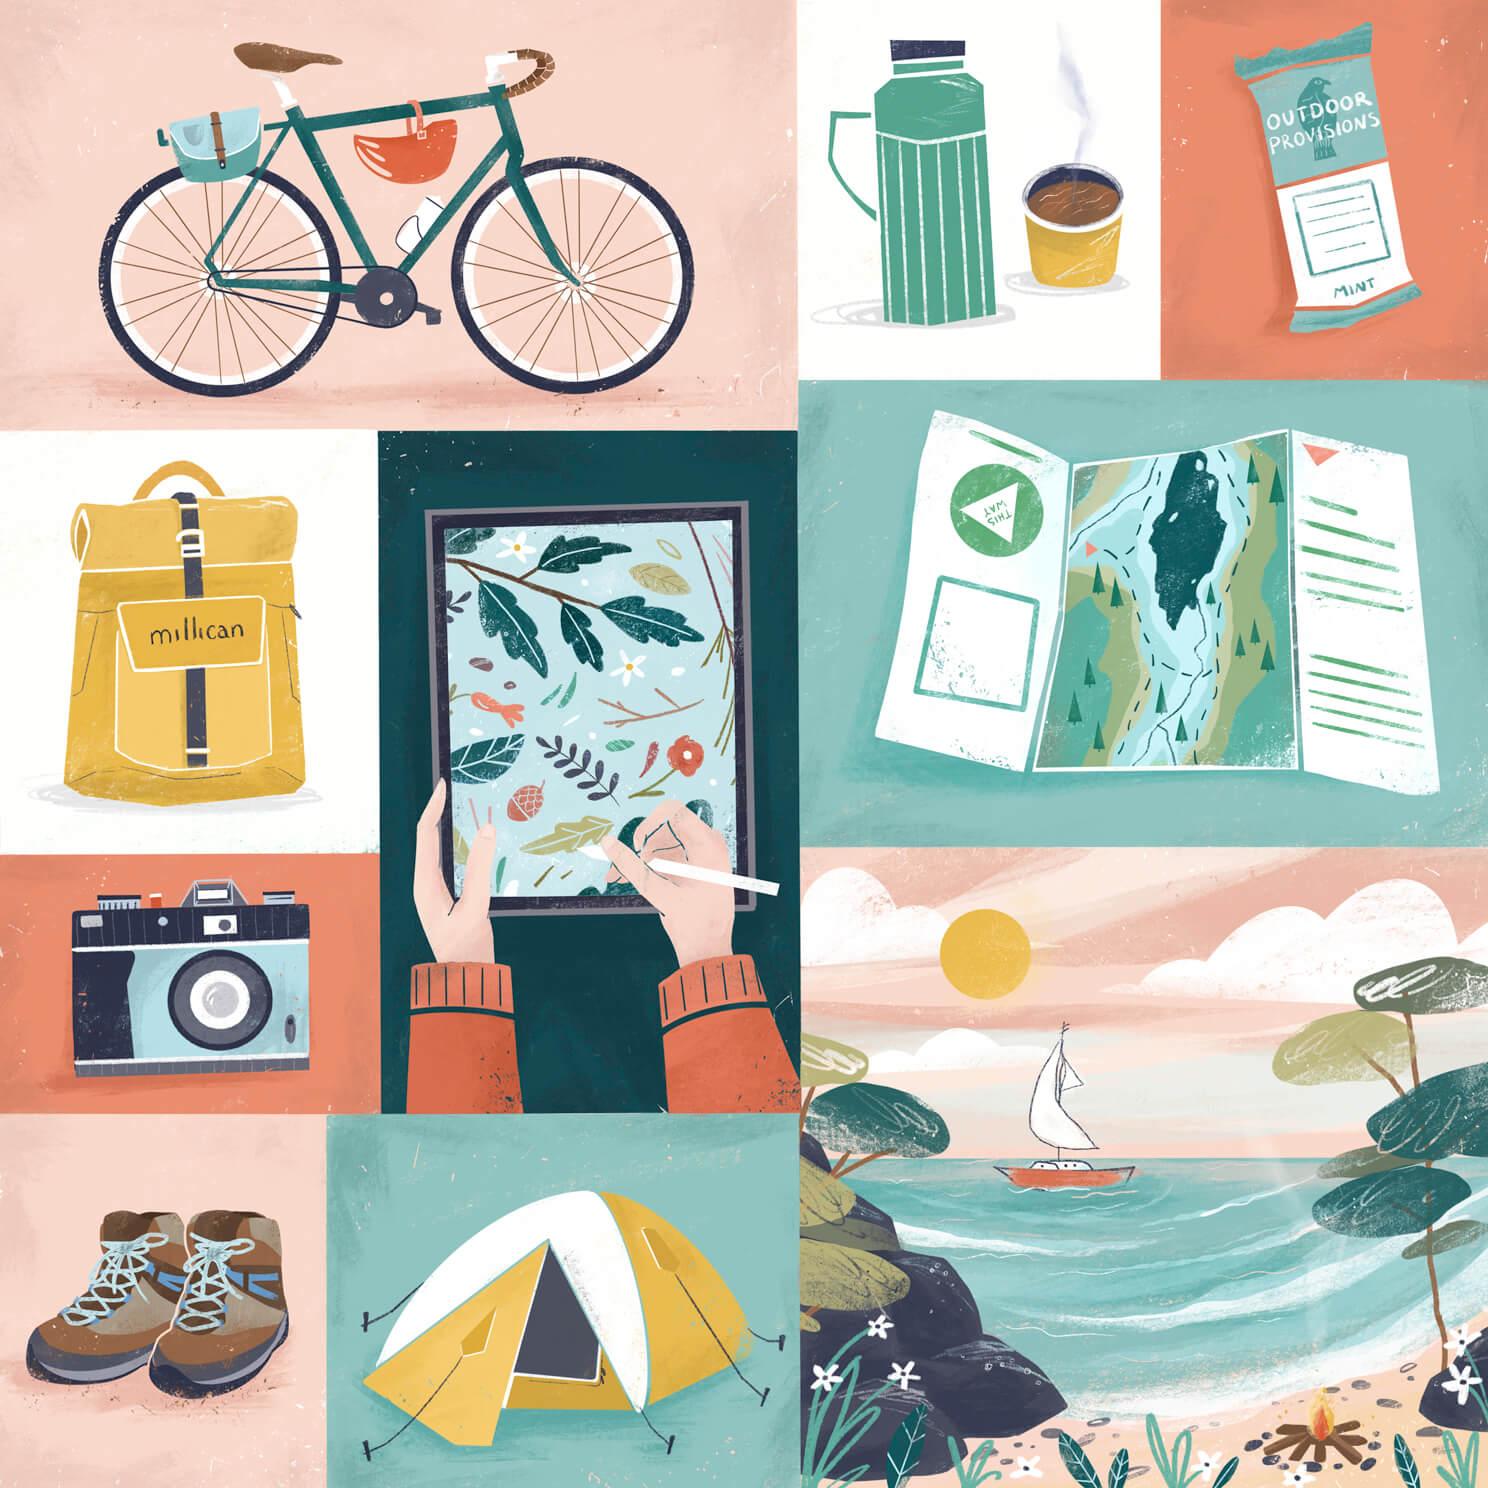 imogen' adventures with bike and millican bag